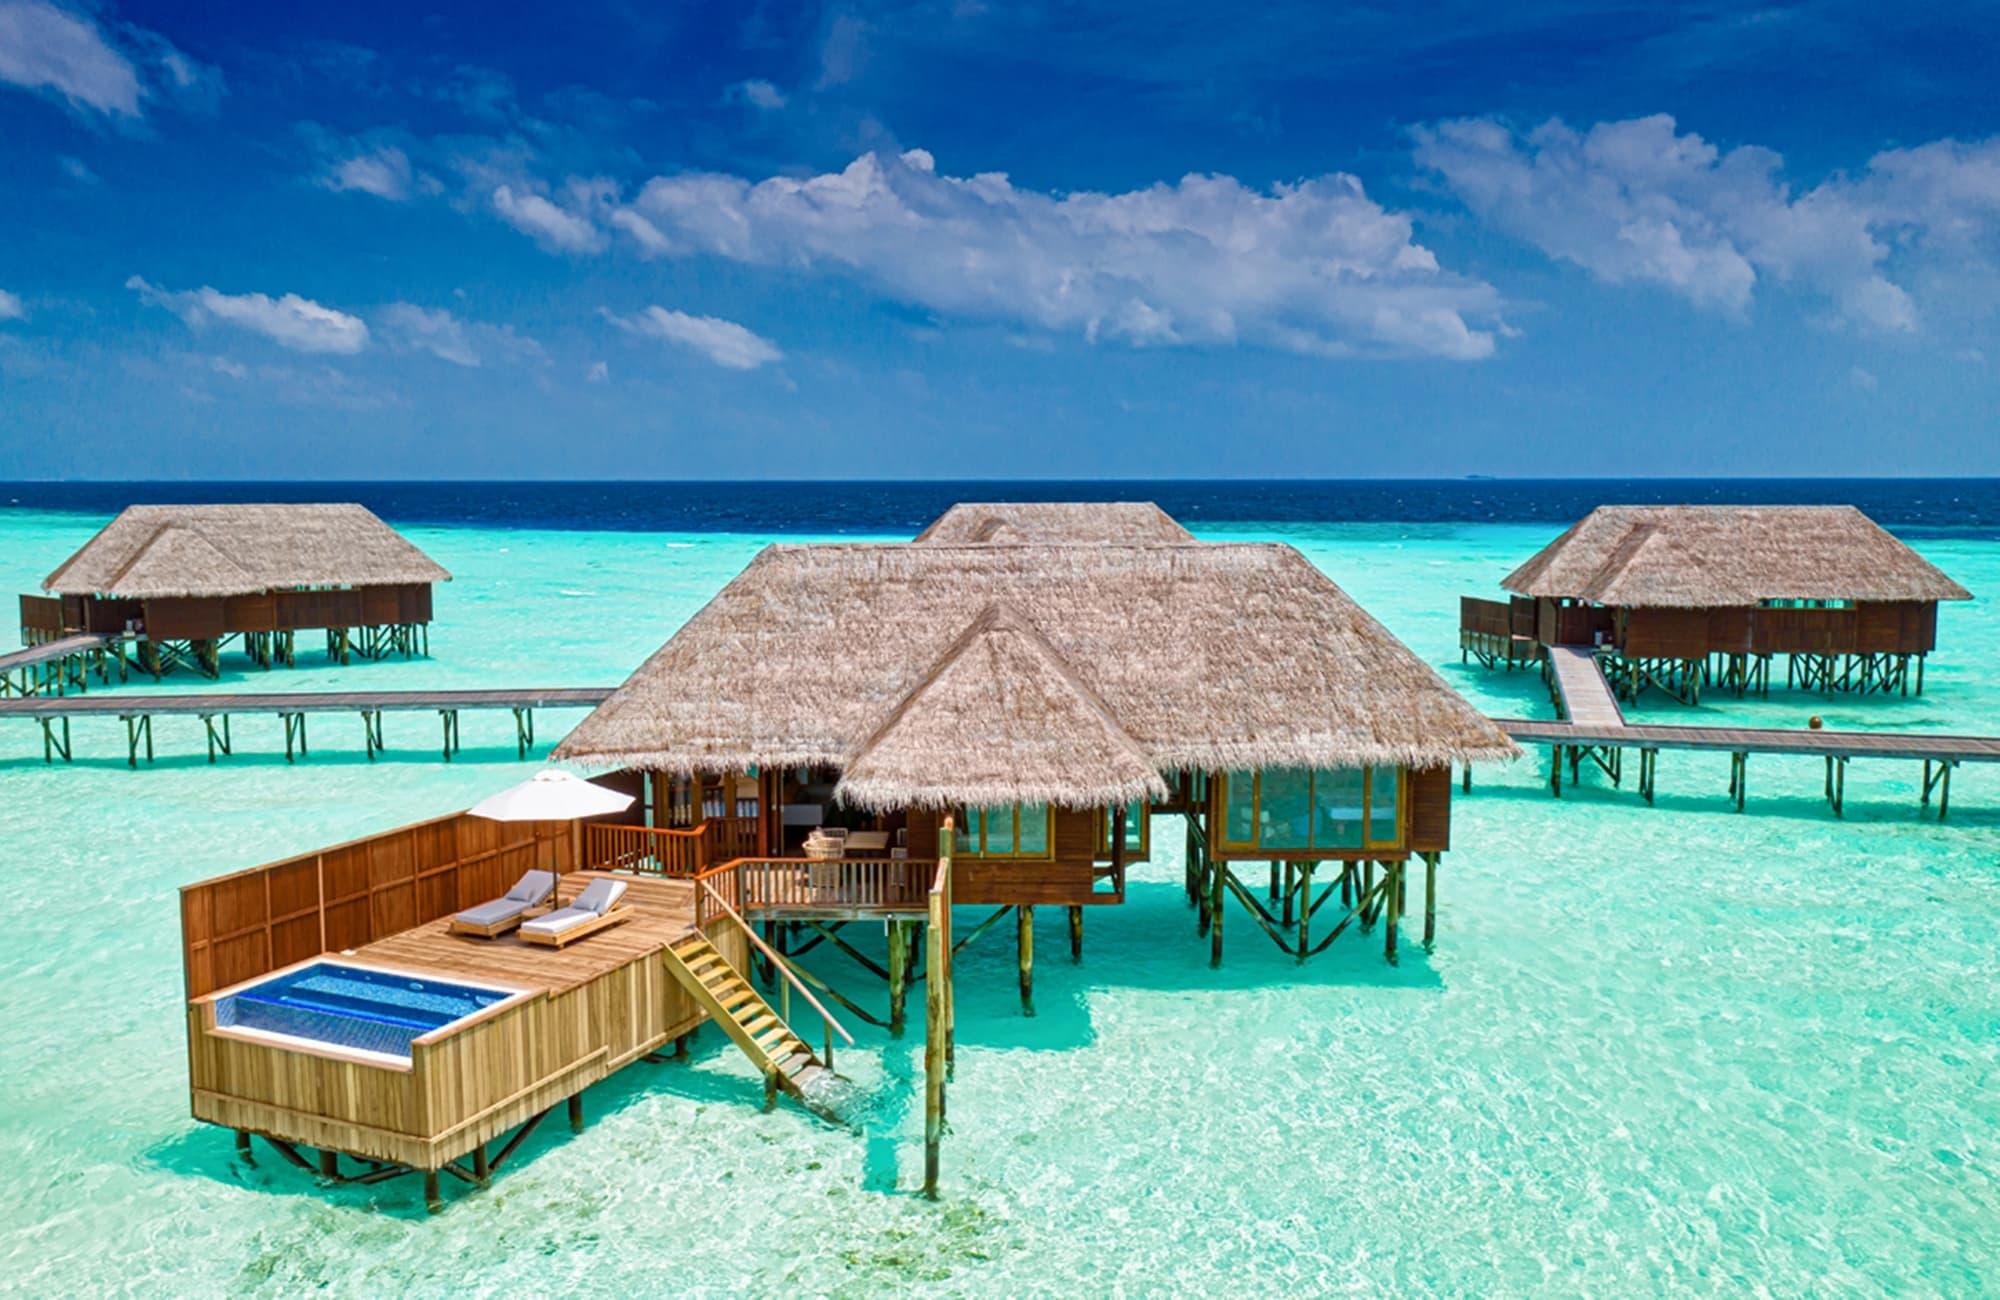 Voyage Maldives - Grand Water Villa with Pool Conrad Maldives - Amplitudes